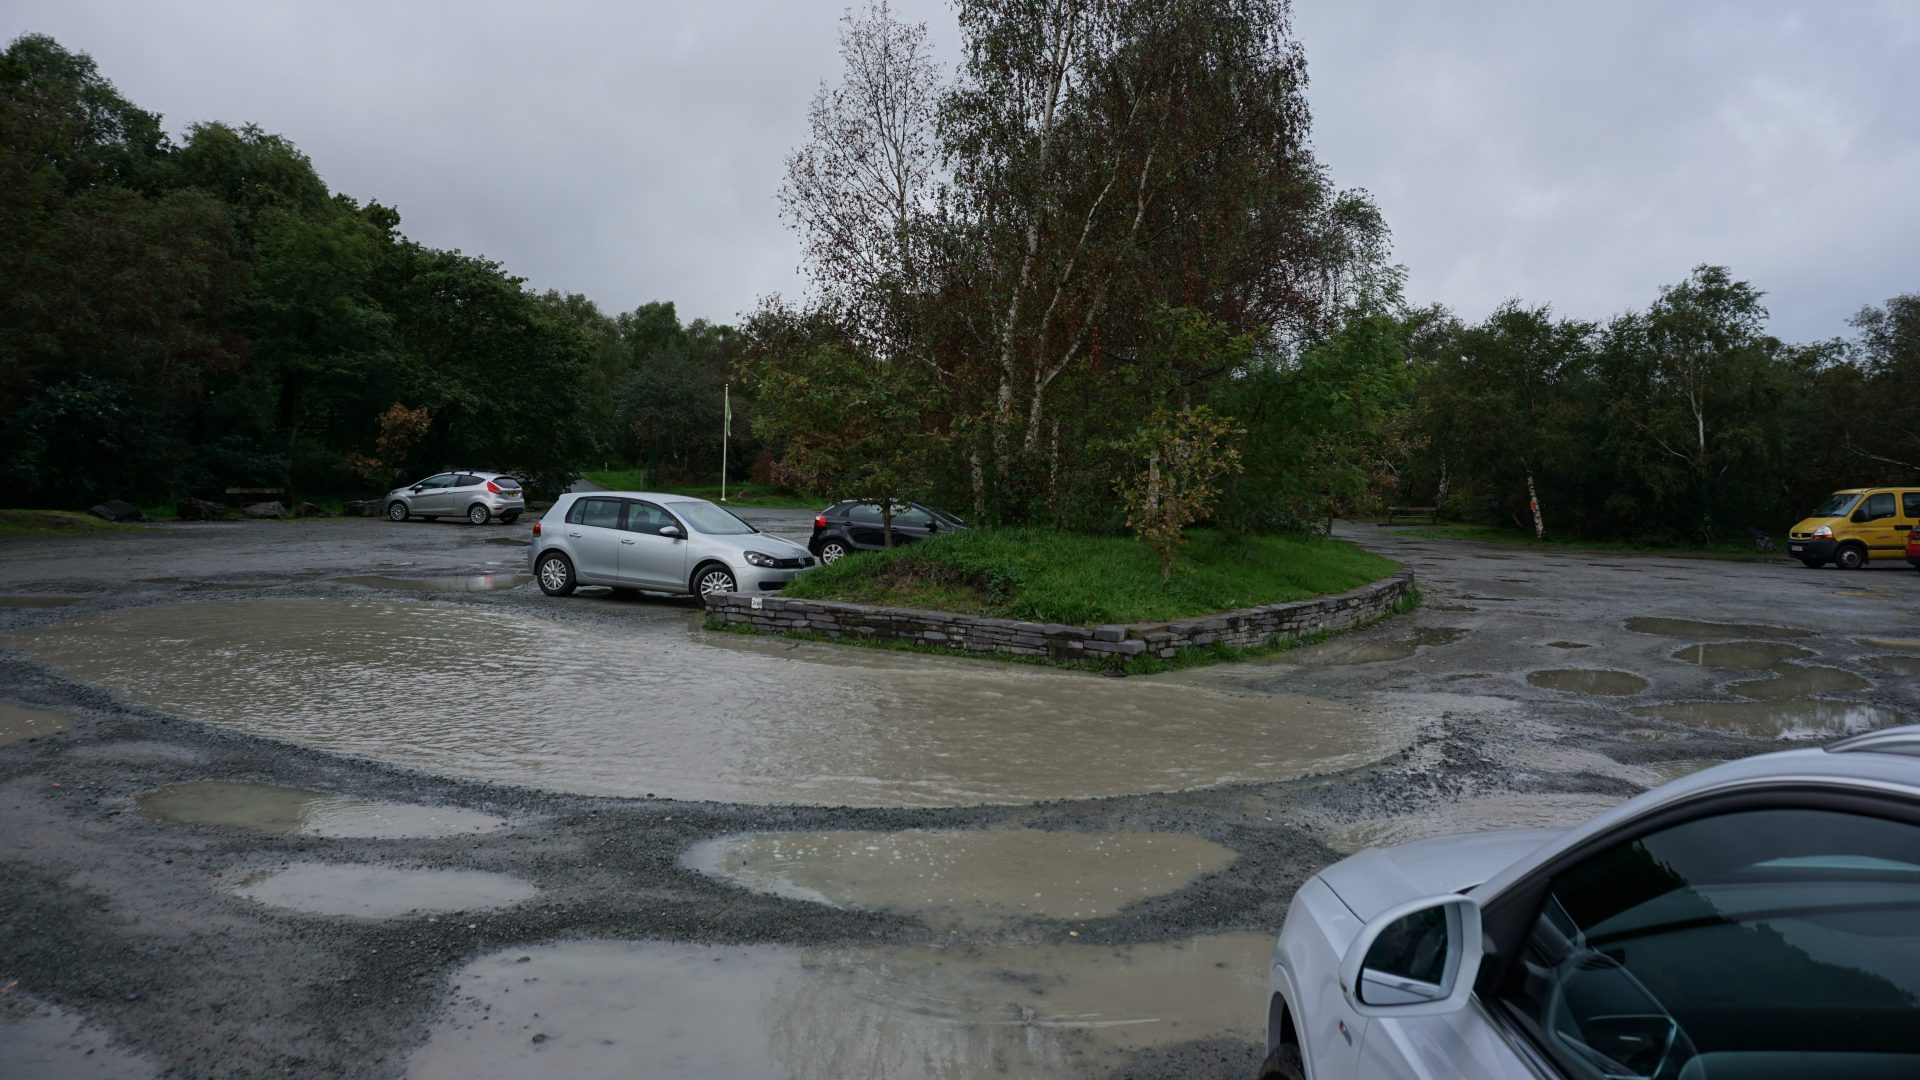 Llyn Padarn Car Park